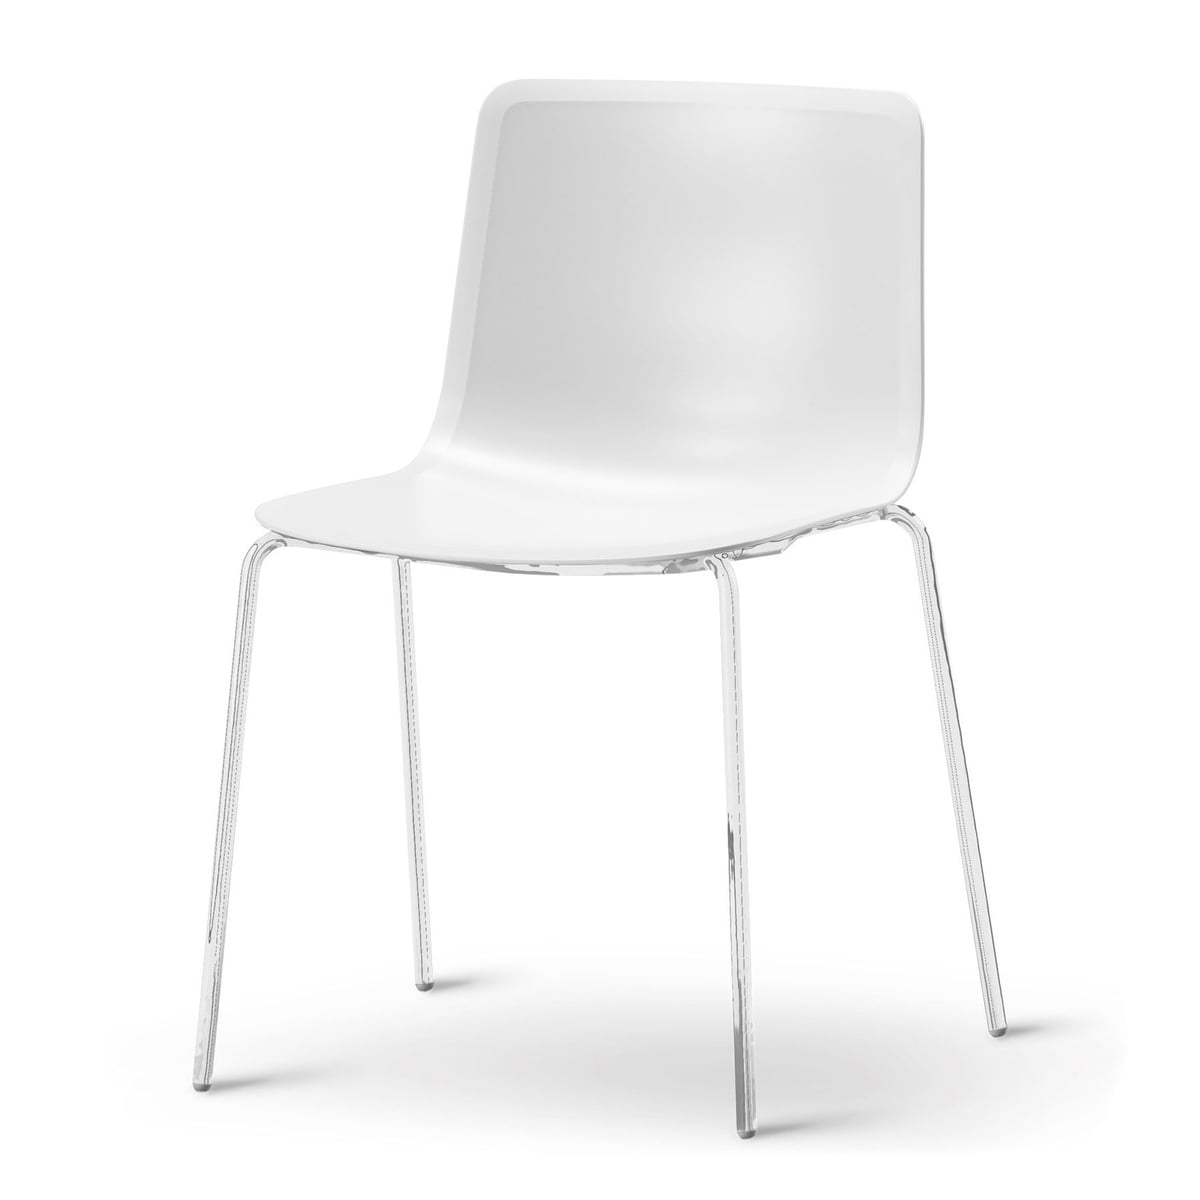 chaise pato fredericia connox. Black Bedroom Furniture Sets. Home Design Ideas